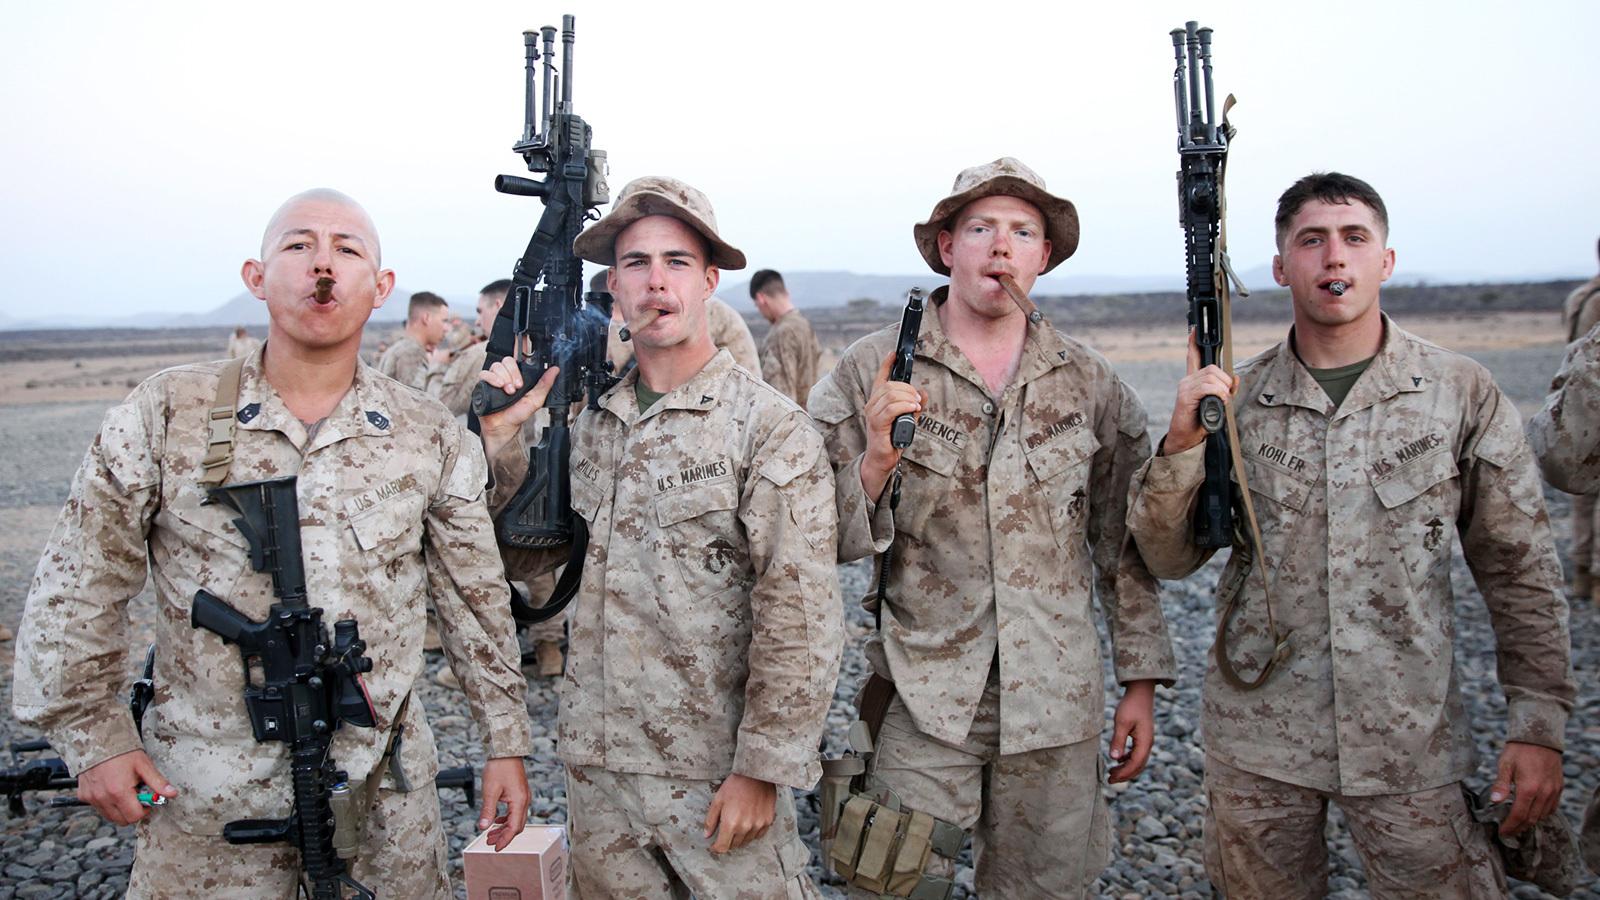 cigars-for-troops-2-1600.jpg